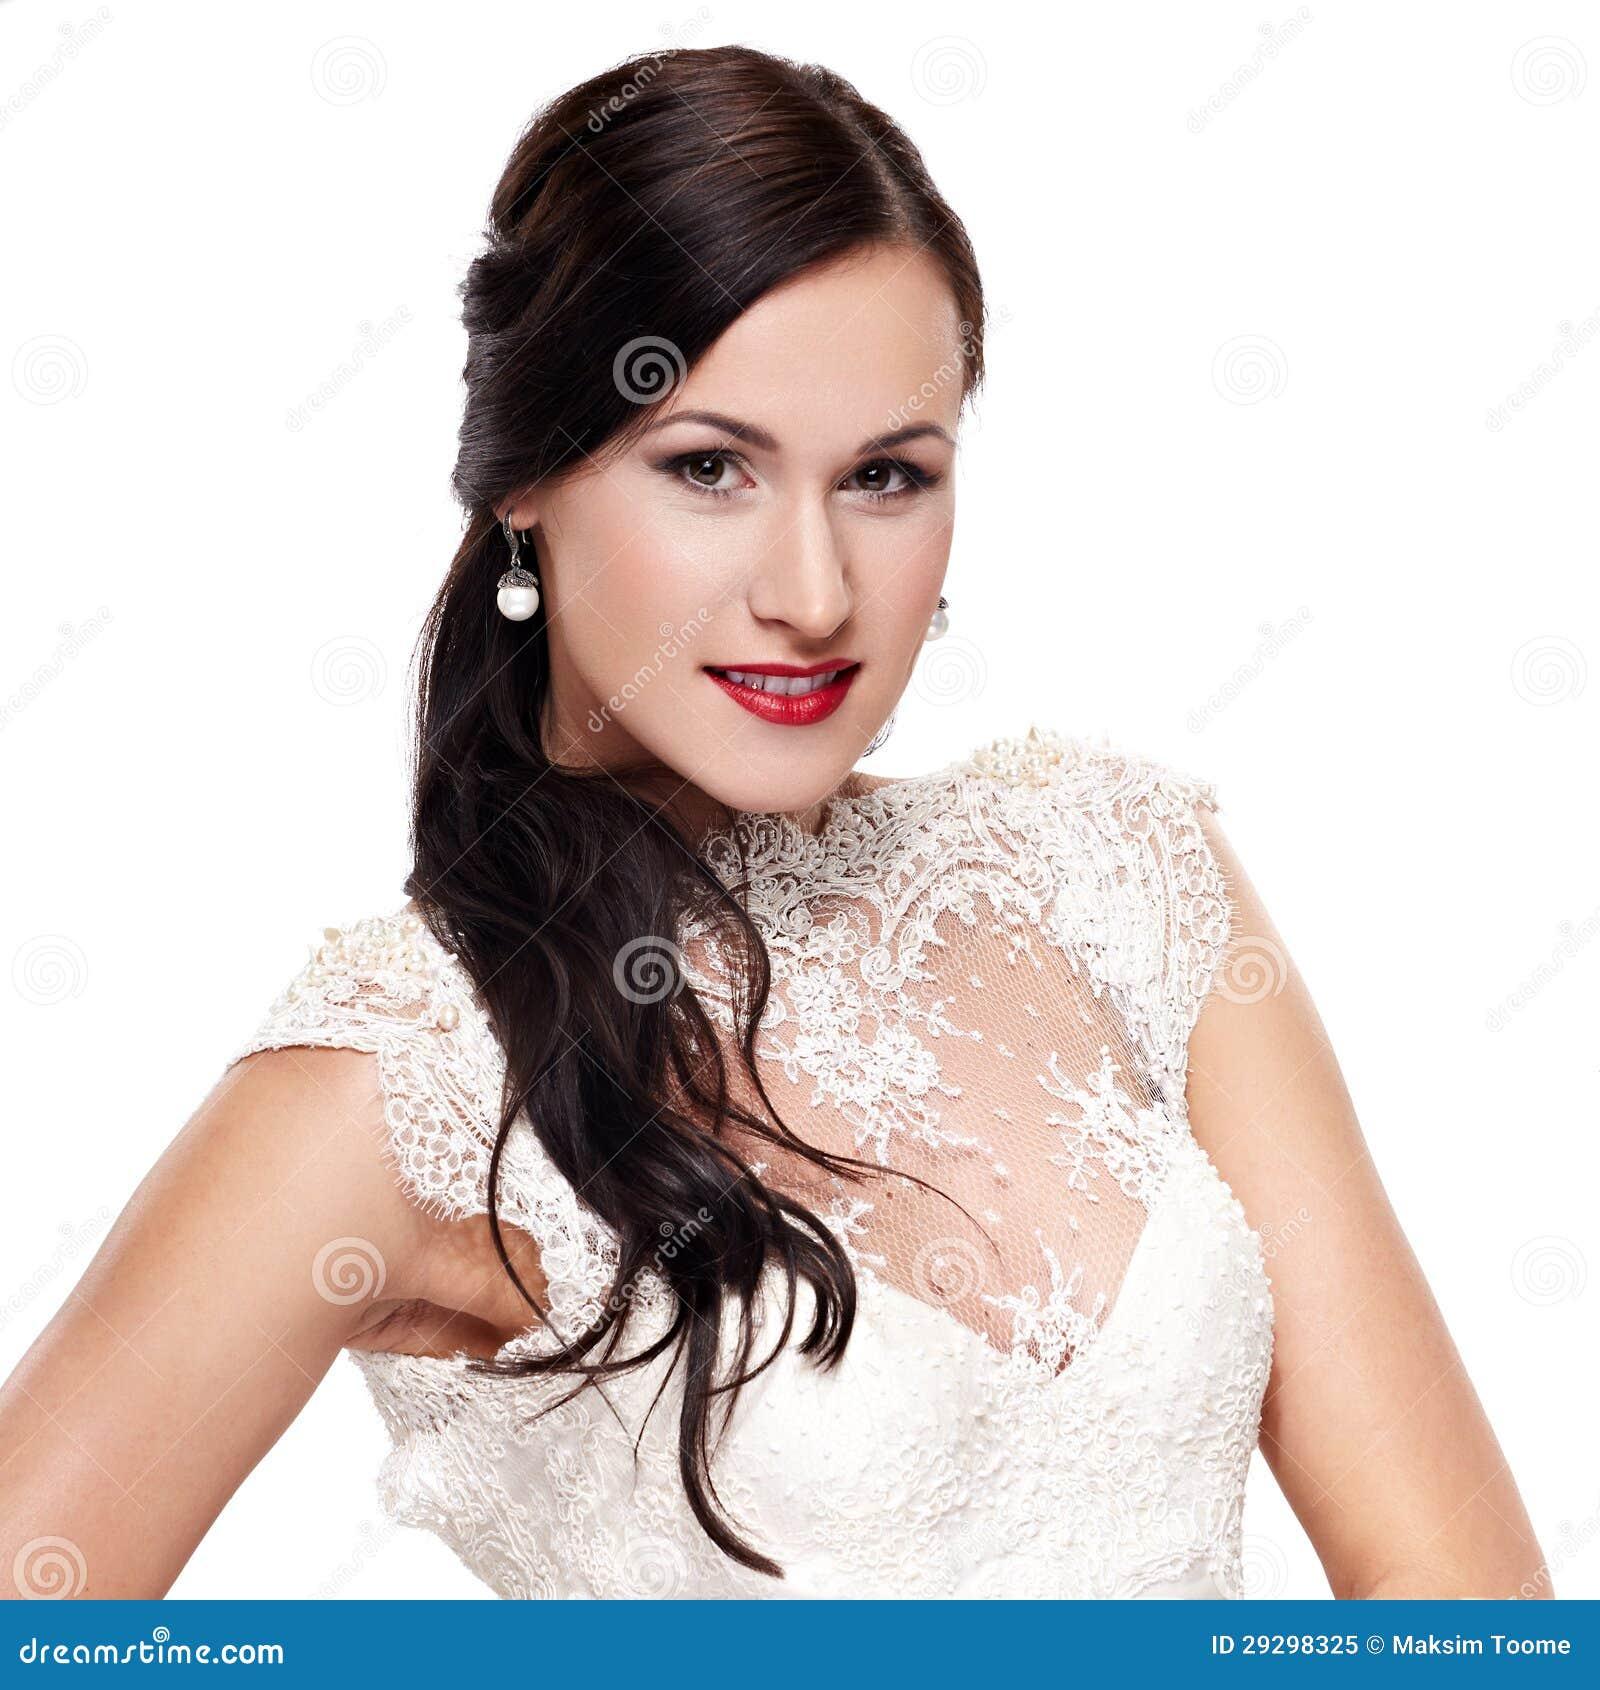 Videos flyleaf beautiful bride <3 hahaha